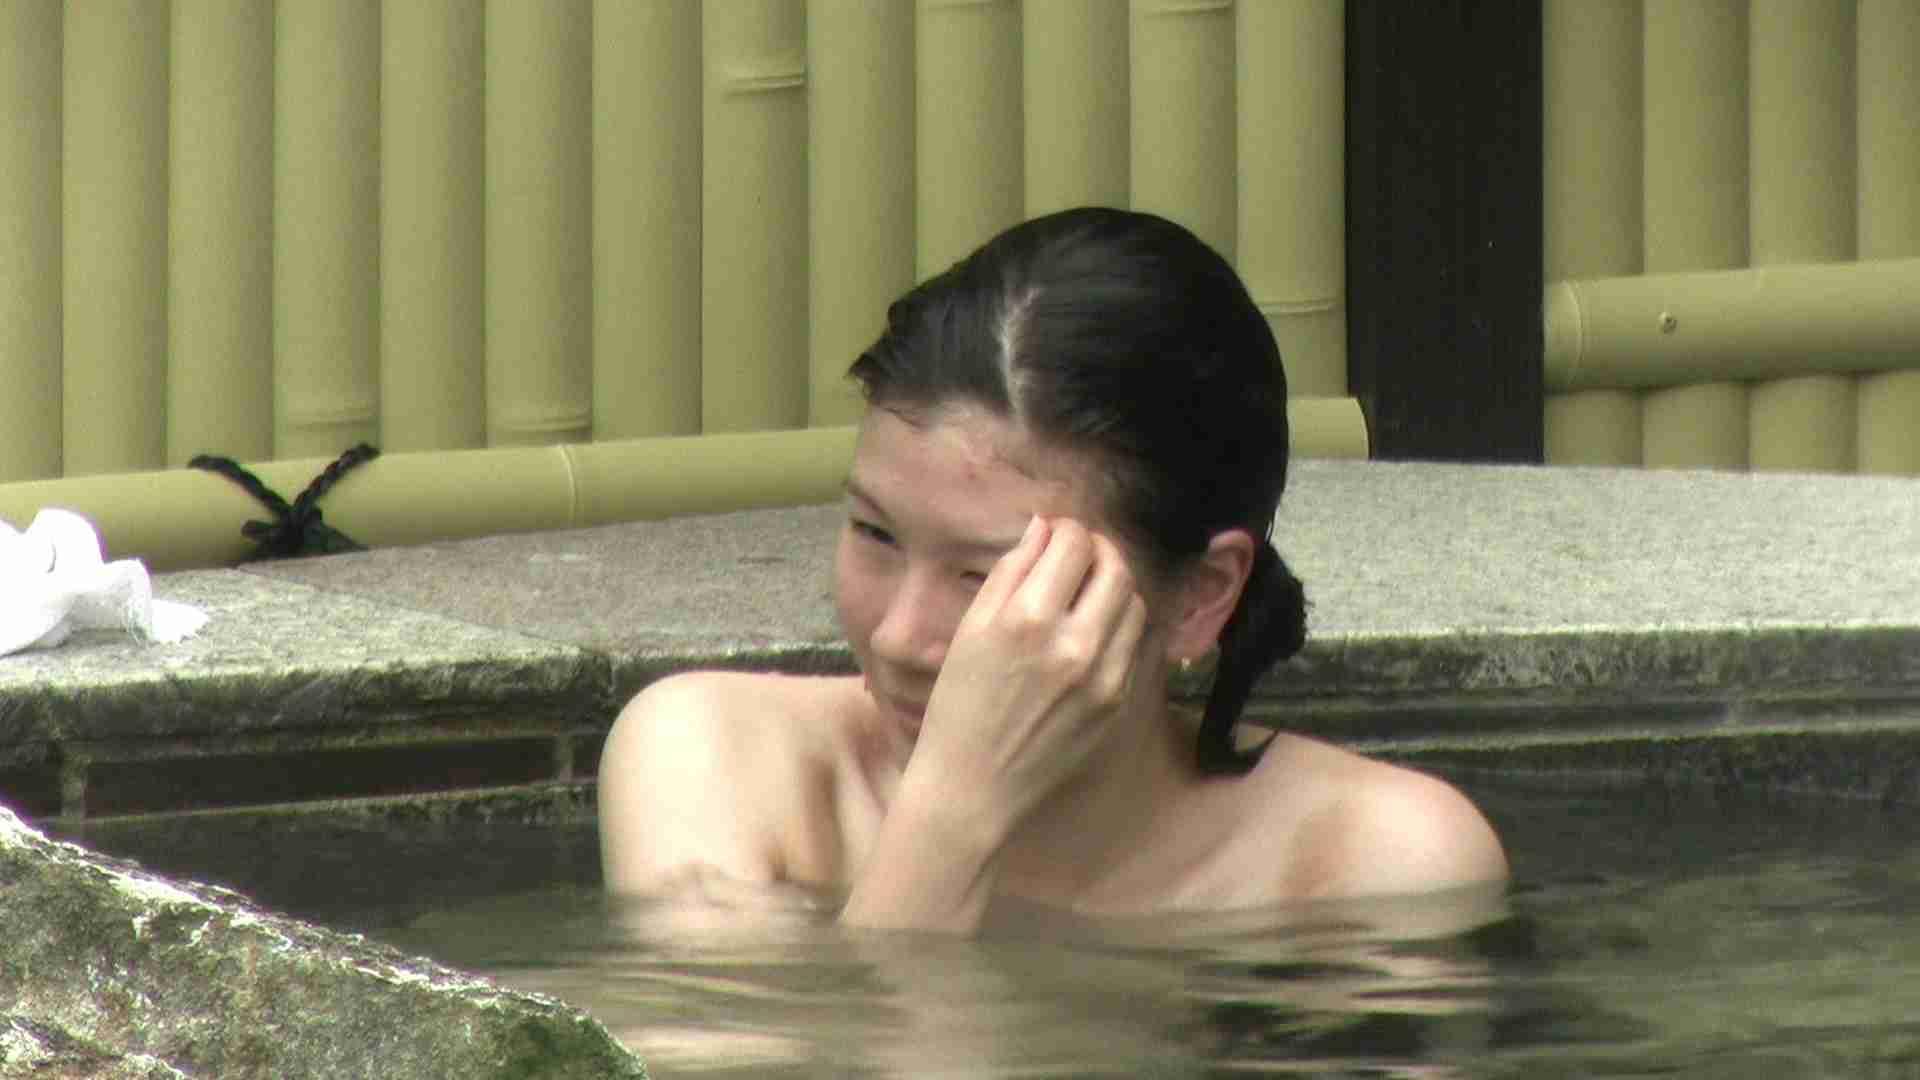 Aquaな露天風呂Vol.187 盗撮映像  99Pix 44